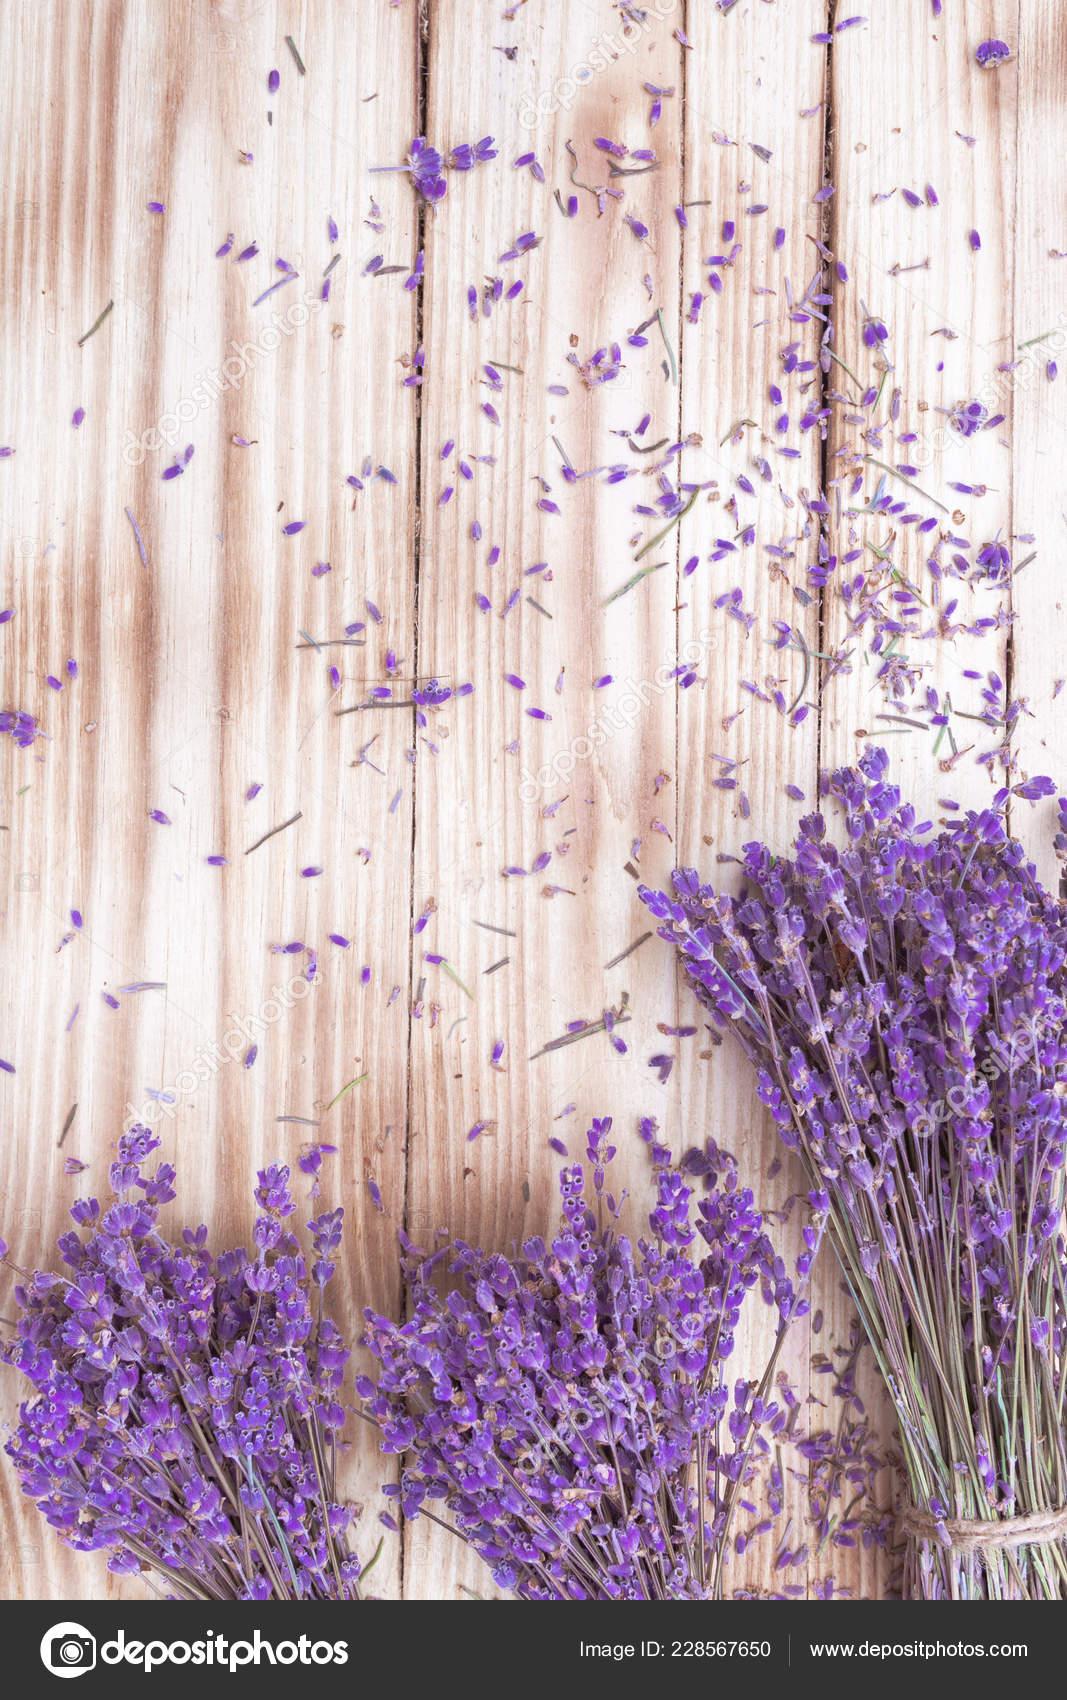 Lavender Dried Flowers Bouquets On Wooden Desk Top View Closeup Stock Photo C Gshanshin 228567650